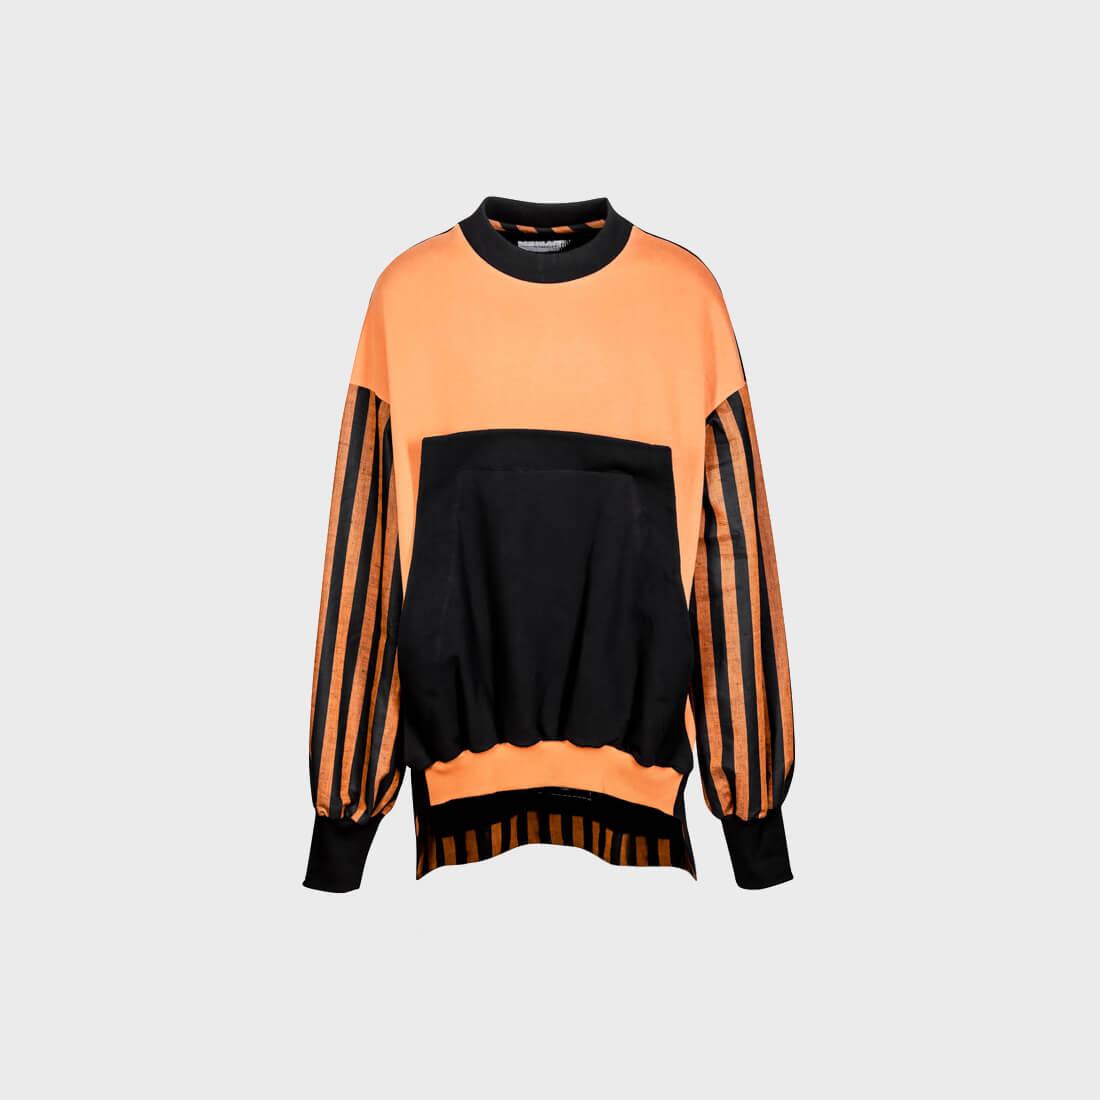 SOSNOVSKA Abstract Combination Sweatshirt